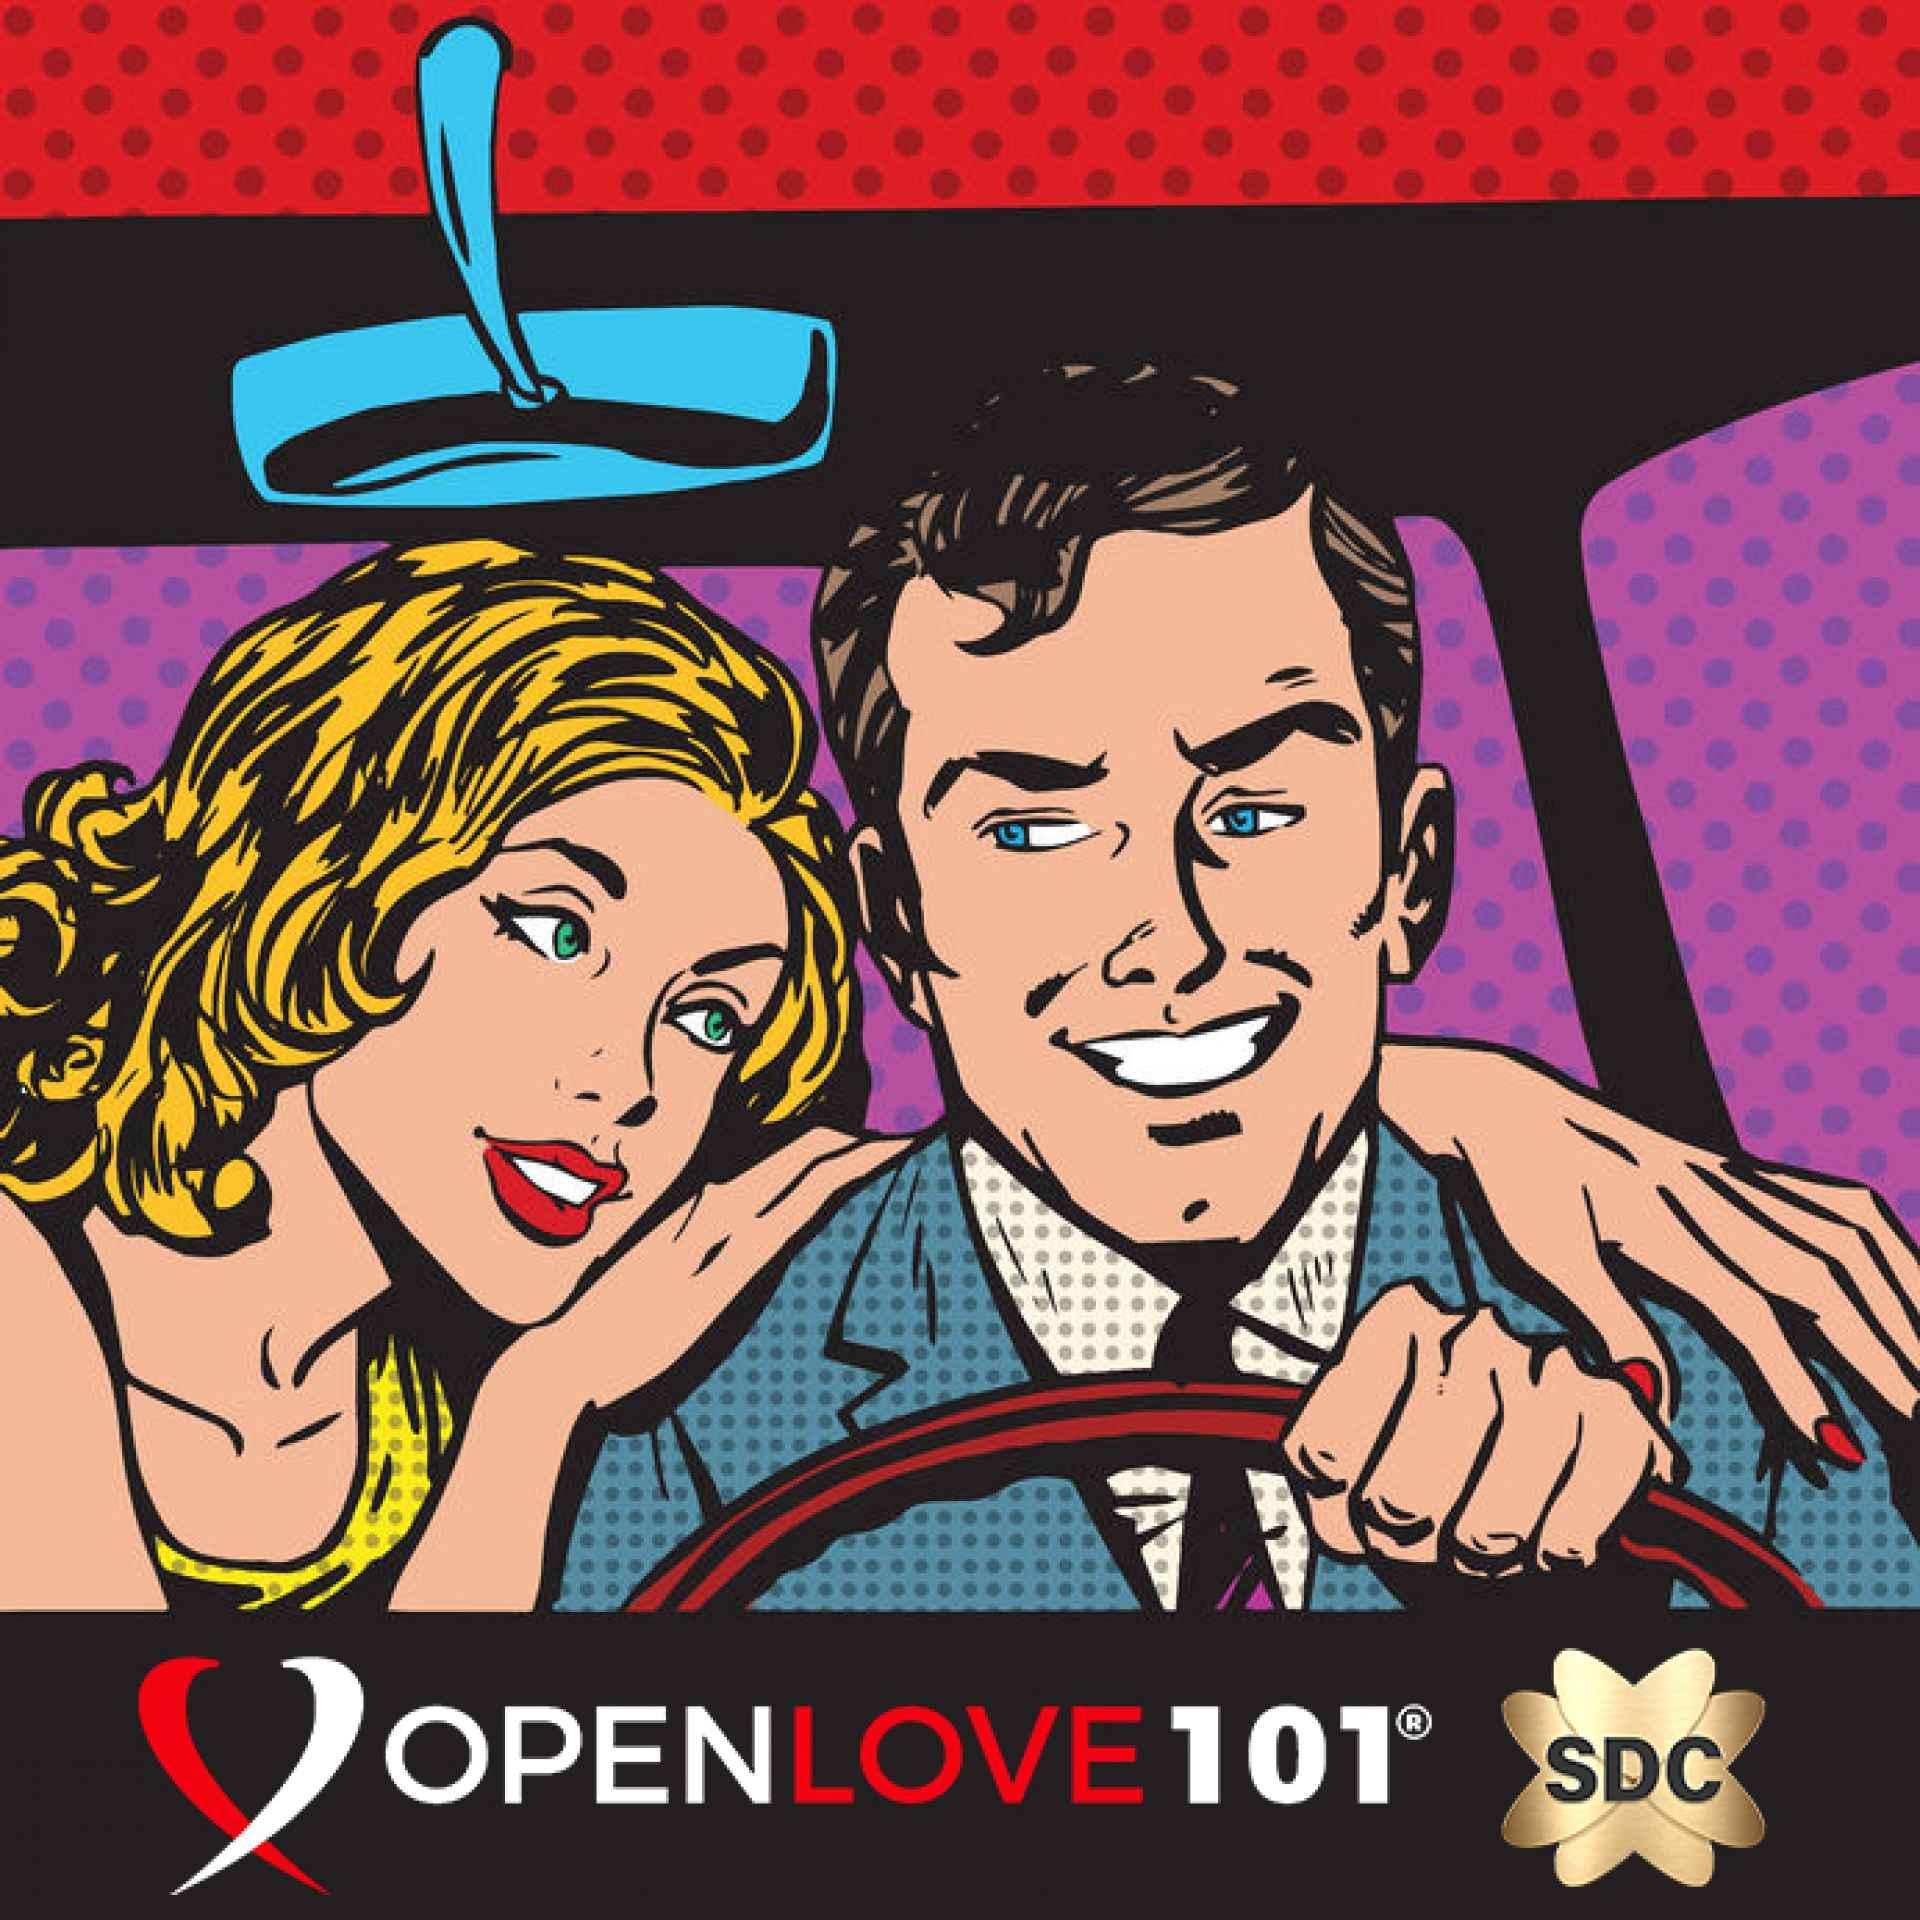 Openlove 101 SDC Newbie Lifestyle Club Guide Après